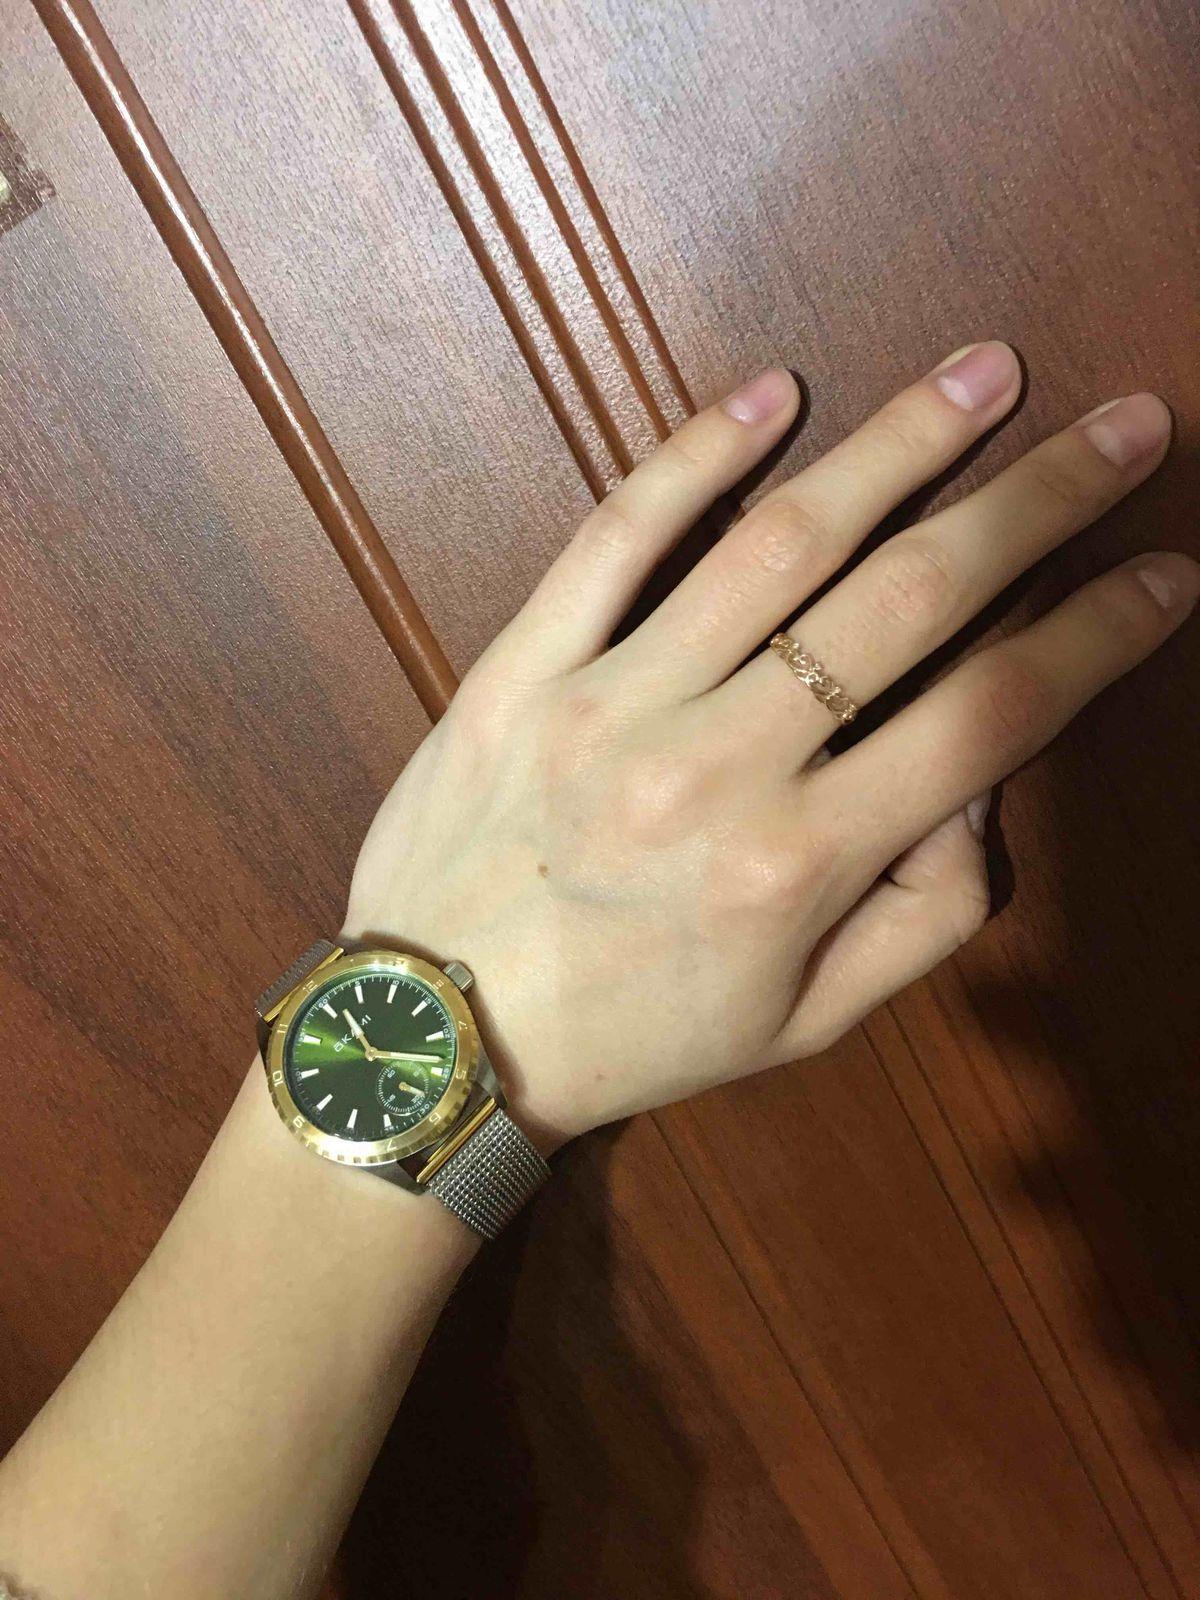 Классная зелень!)